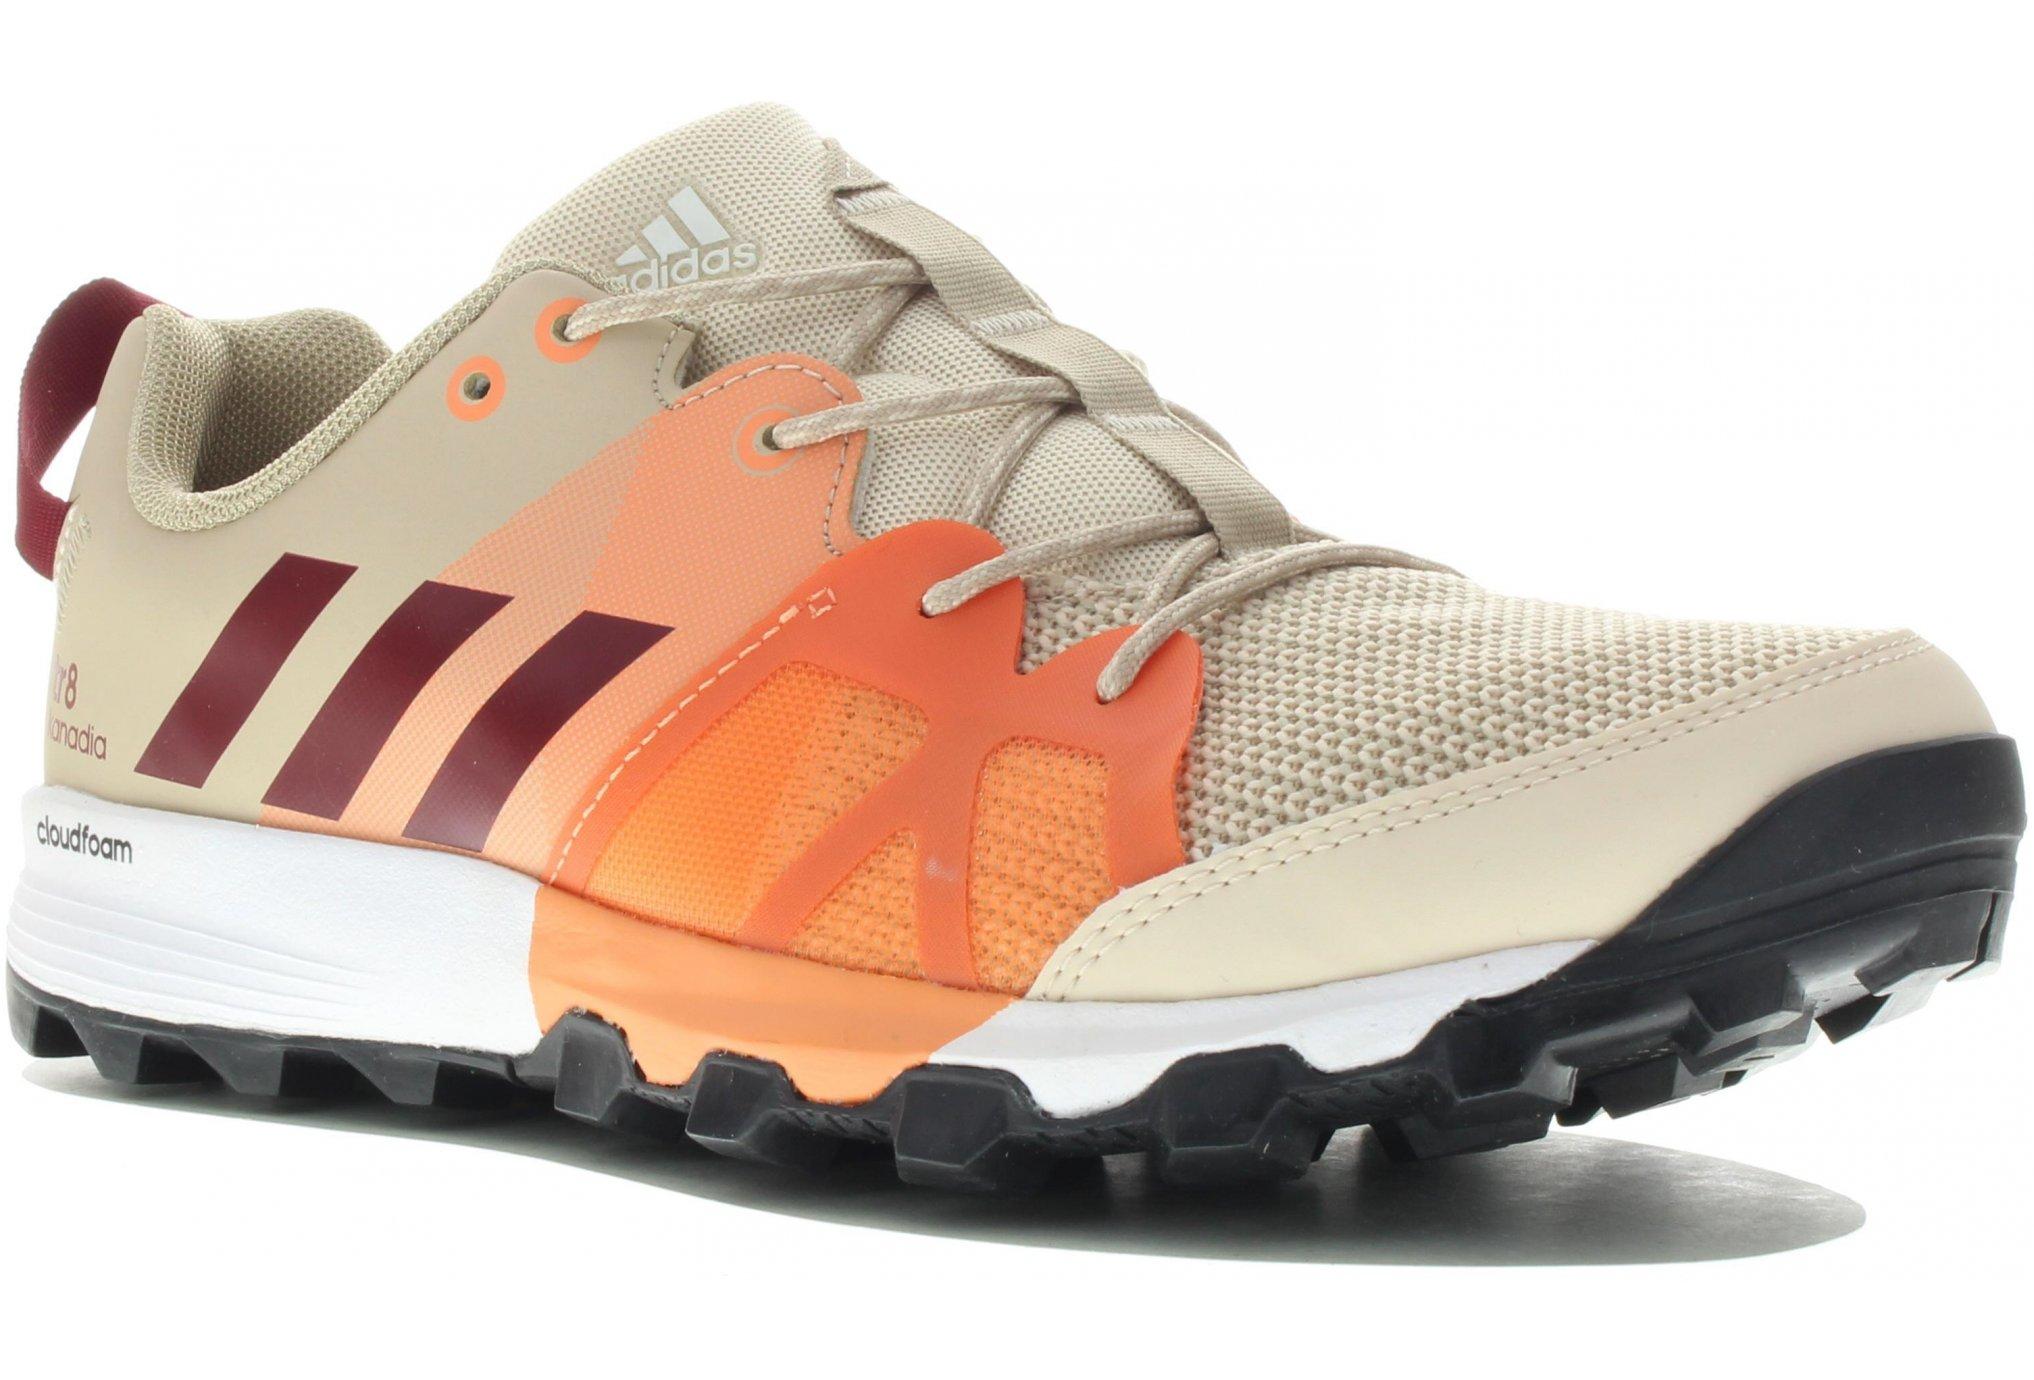 Adidas Kanadia 8 tr w diététique chaussures femme